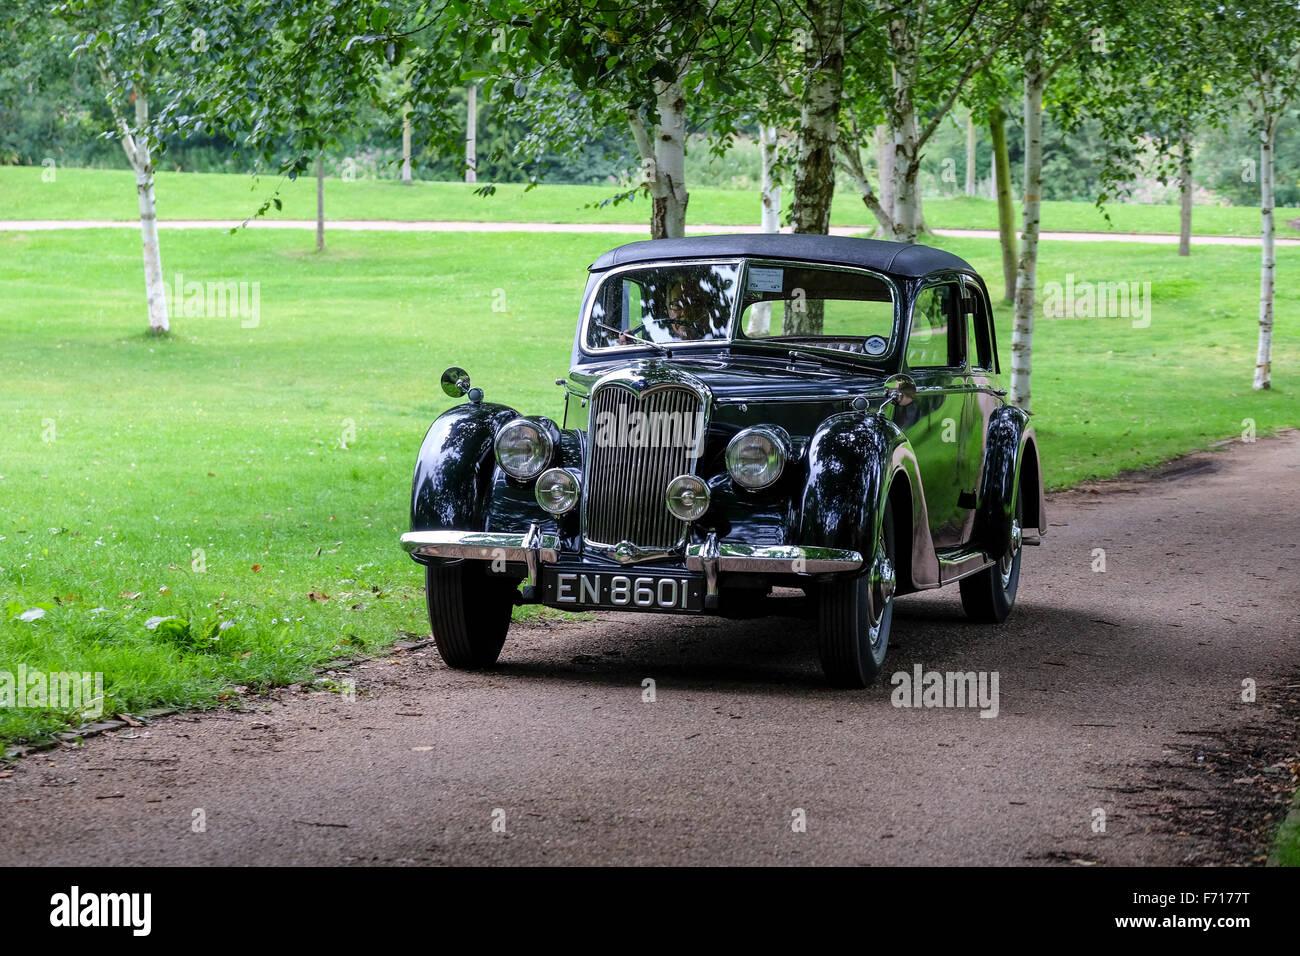 Classic Riley Motor car - Stock Image